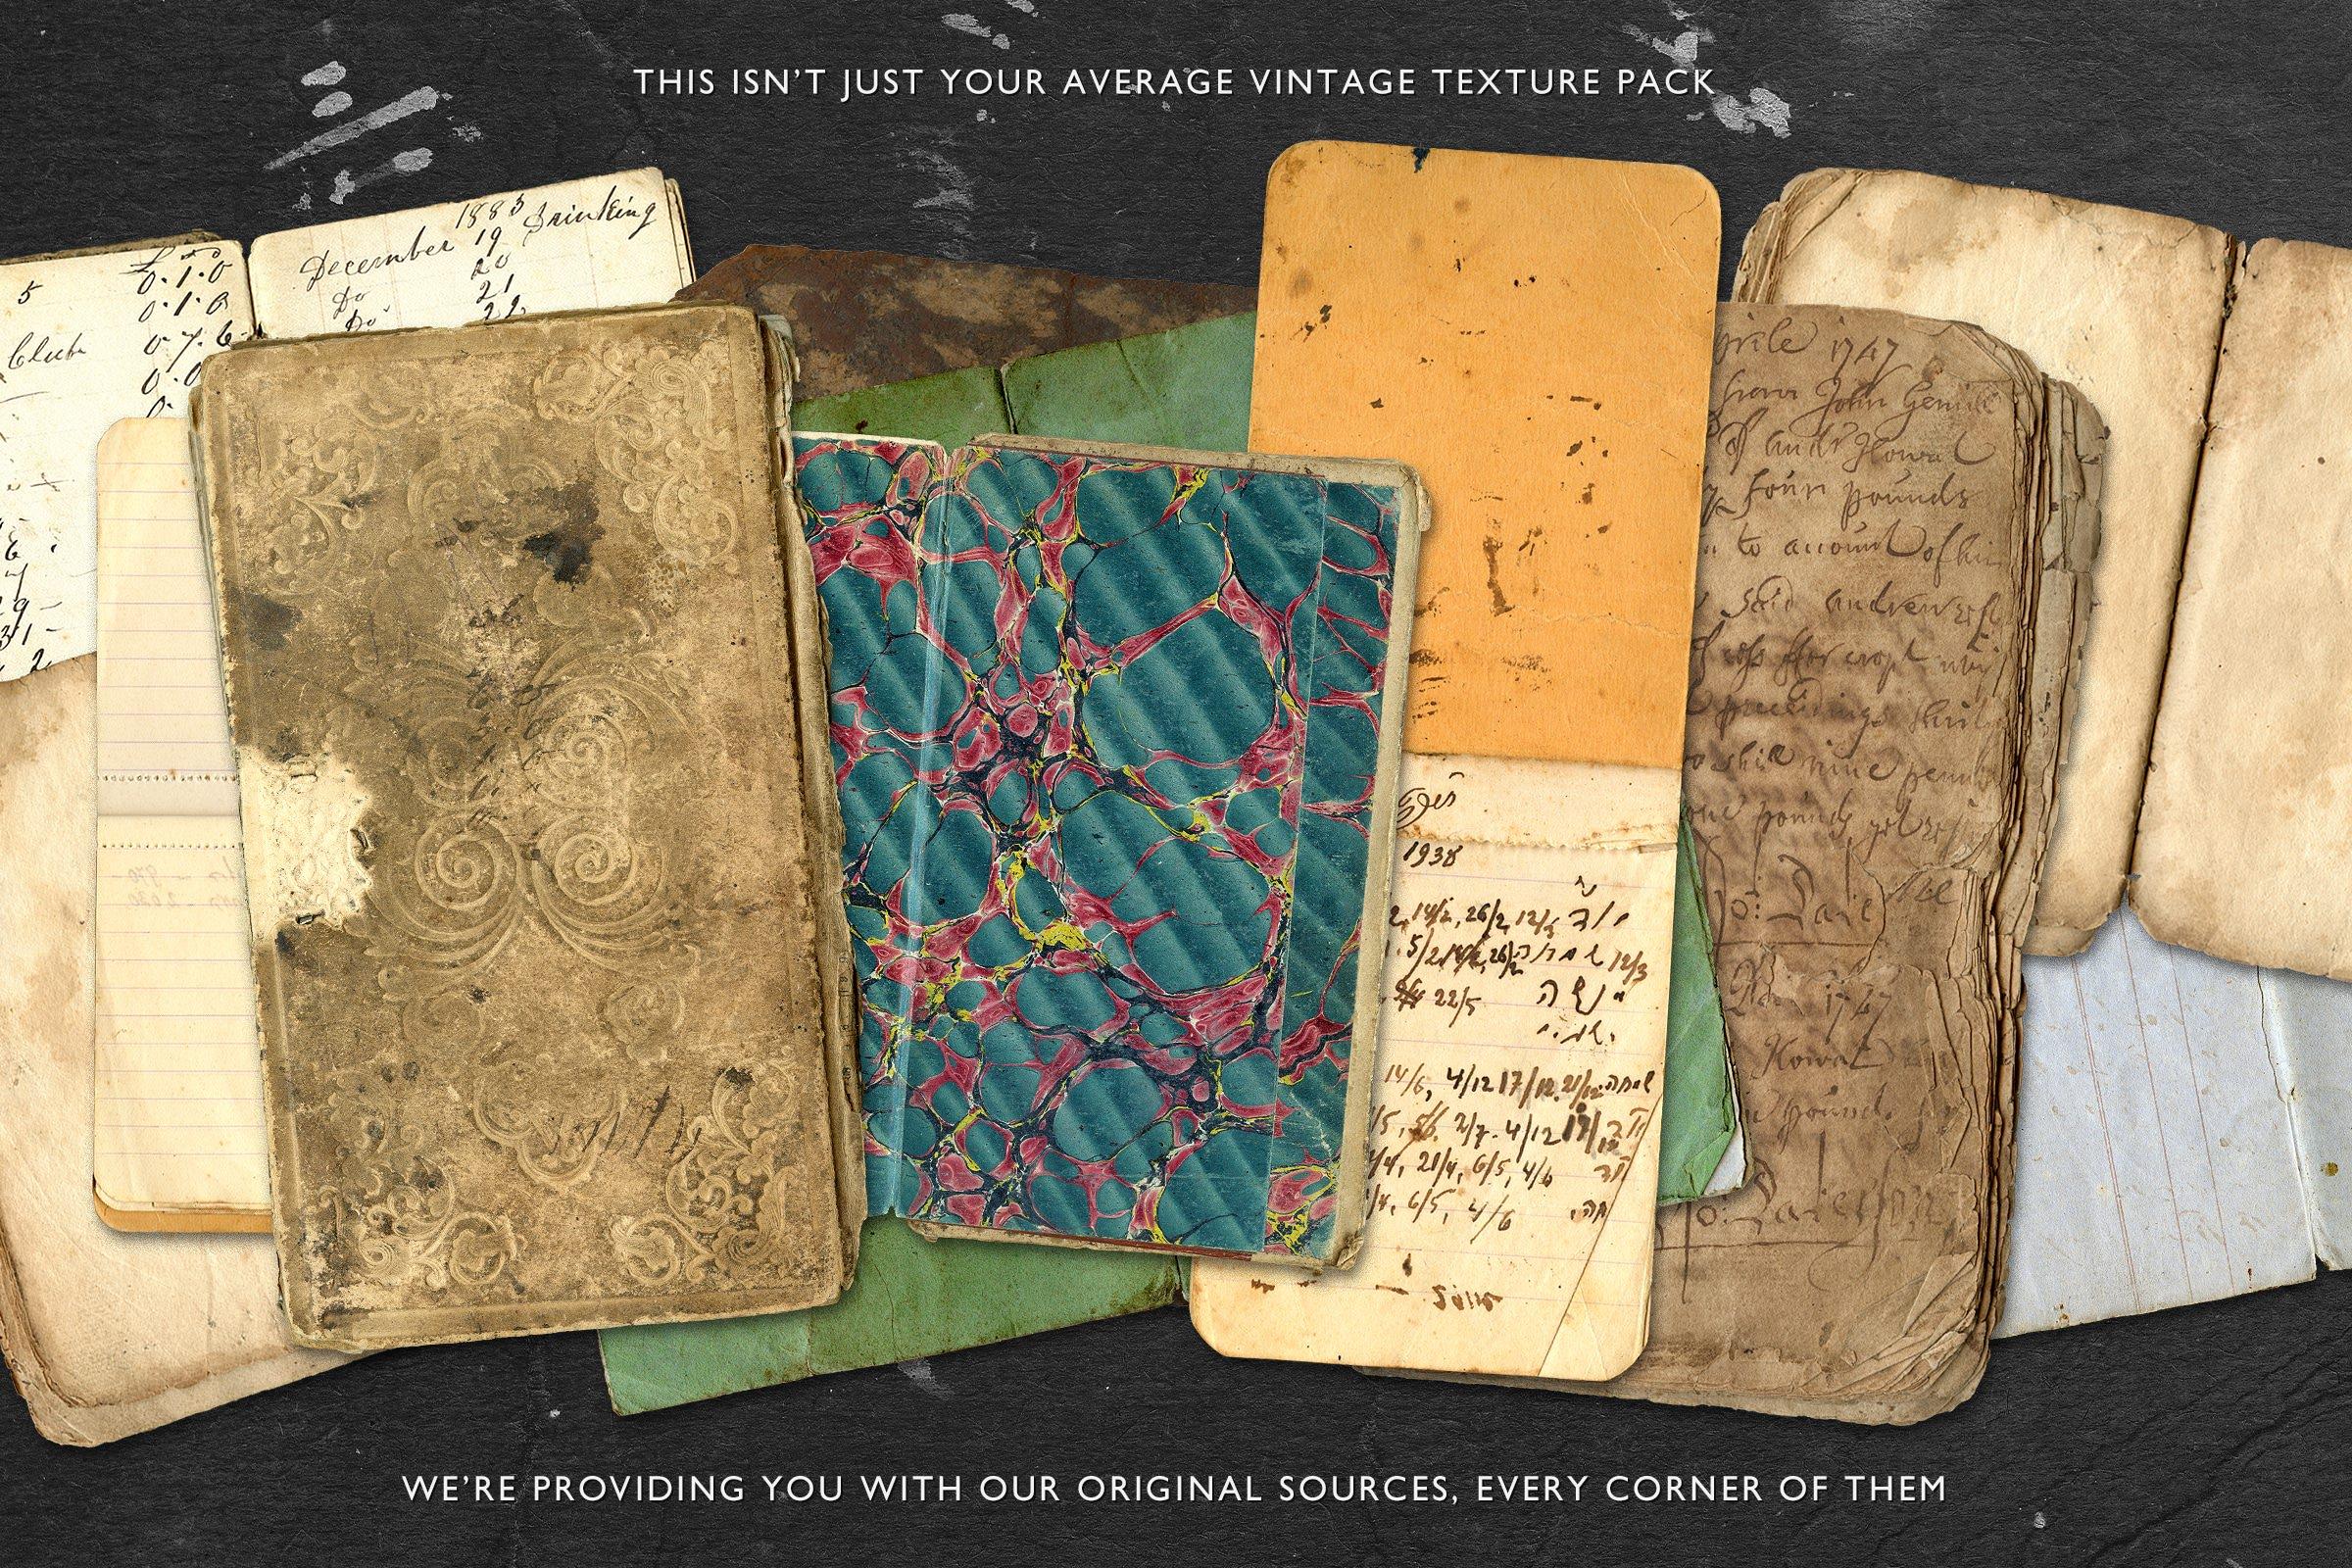 Vintage Book & Paper Texture Pack